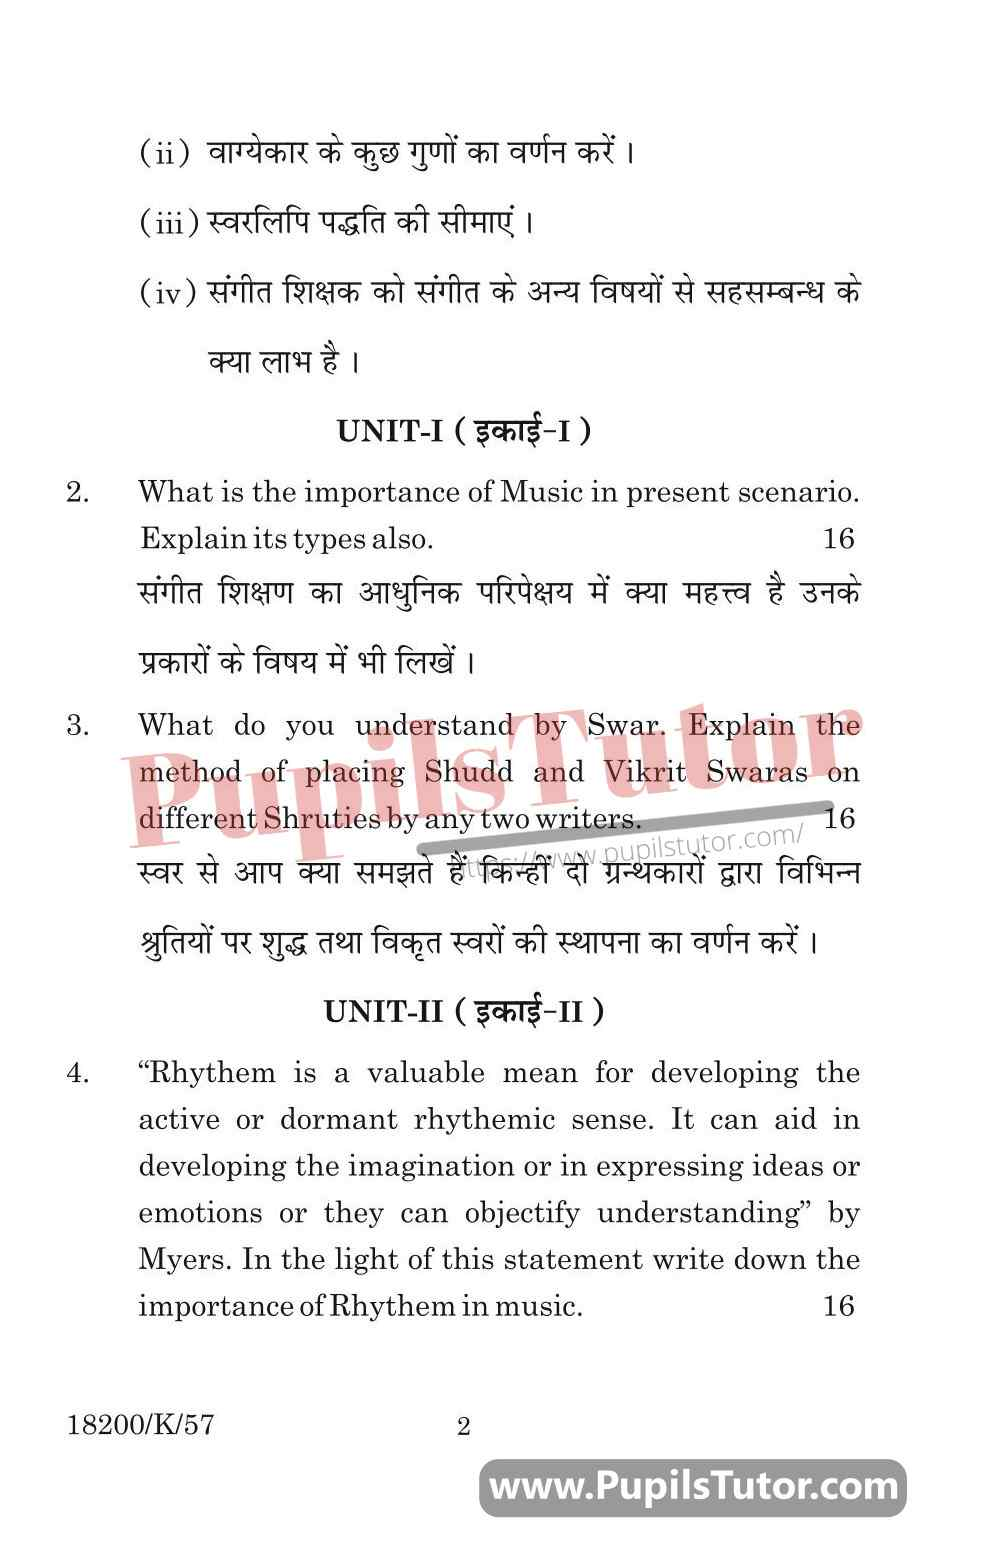 KUK (Kurukshetra University, Haryana) Pedagogy Of Music Question Paper 2020 For B.Ed 1st And 2nd Year And All The 4 Semesters In English And Hindi Medium Free Download PDF